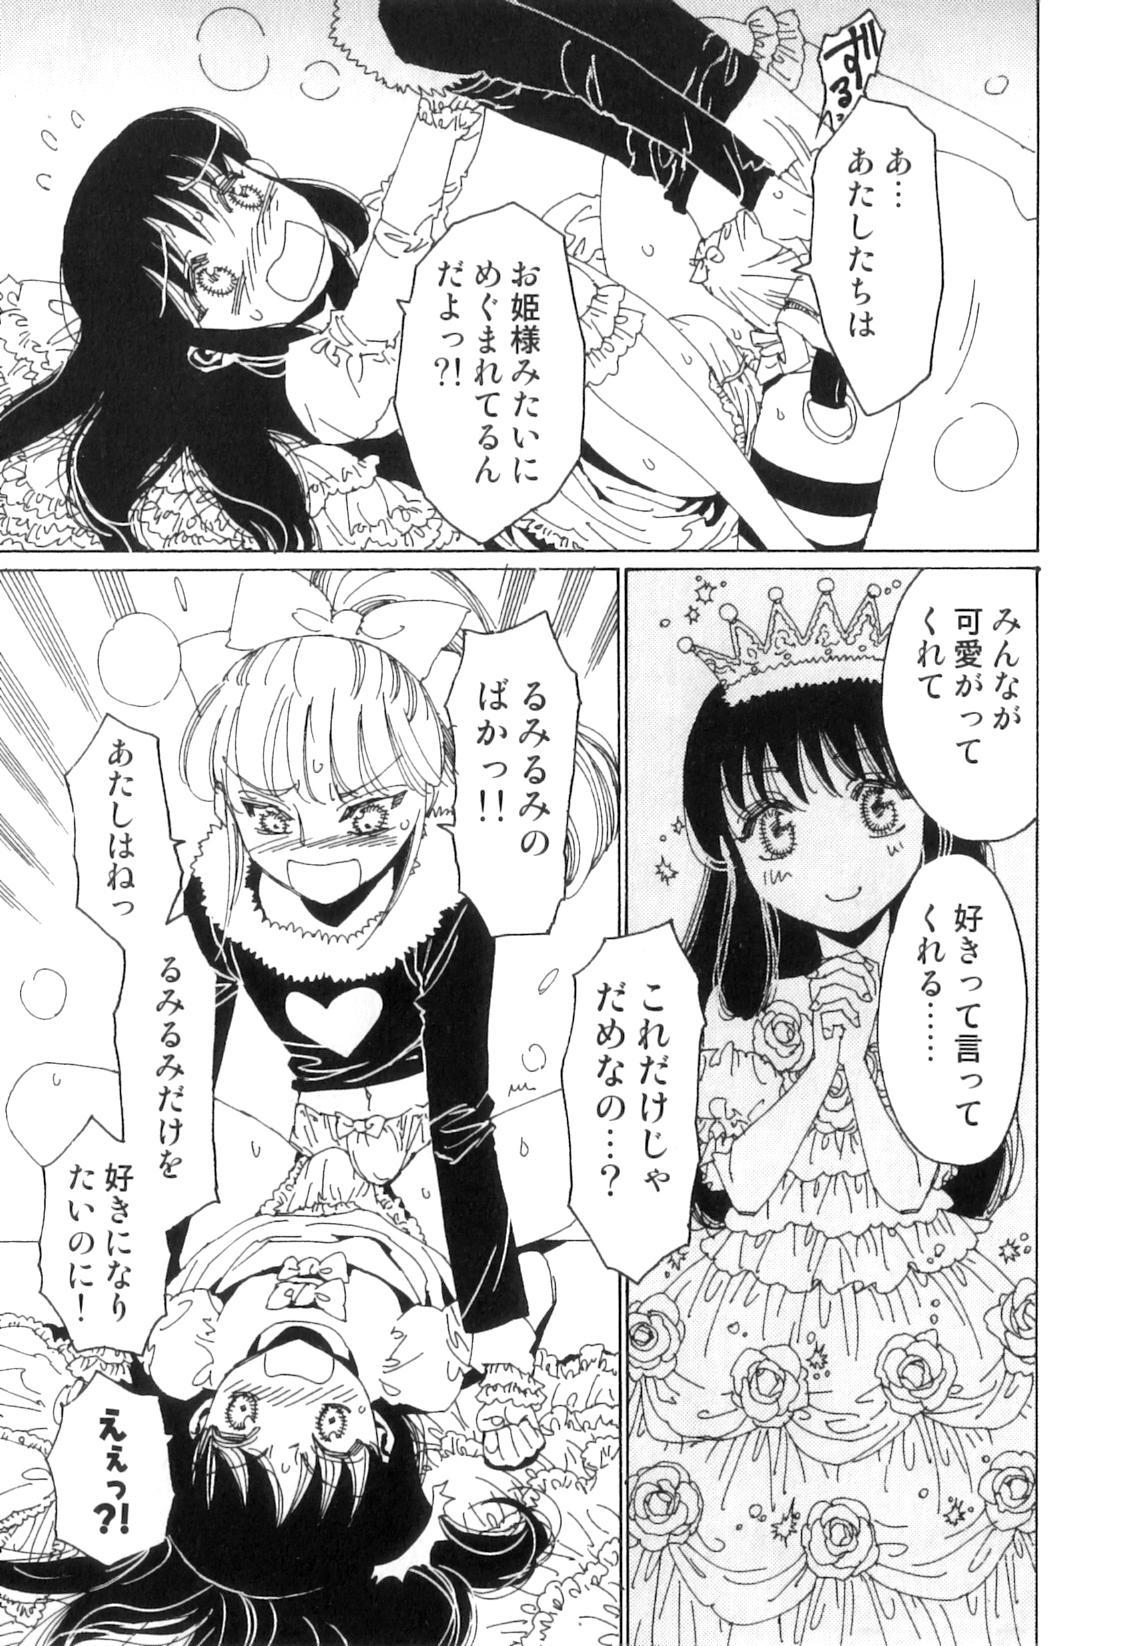 Yuni-Hapi 21